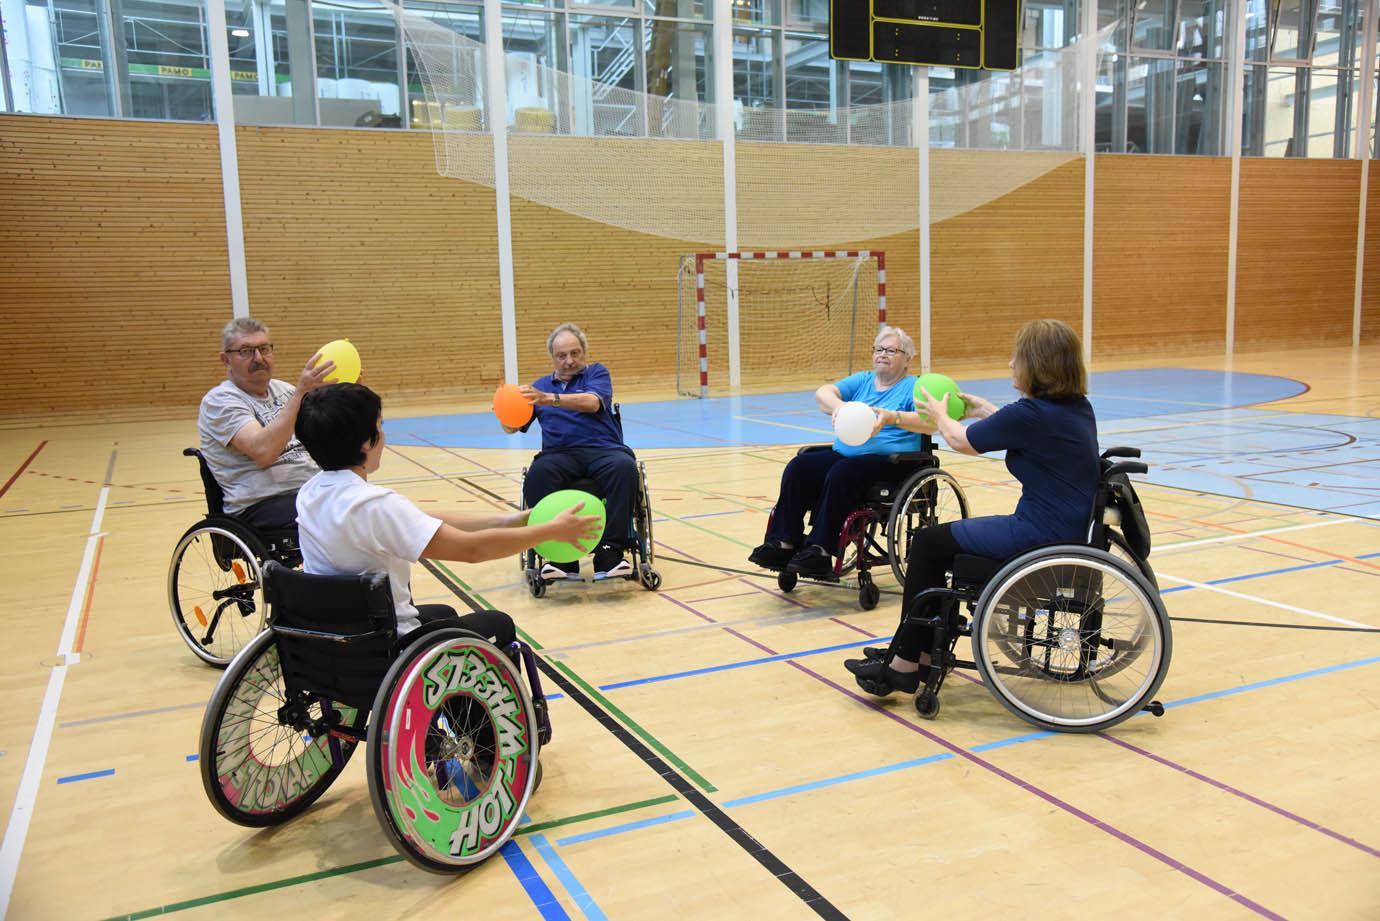 Sporttherapie Spiele im Rollstuhl